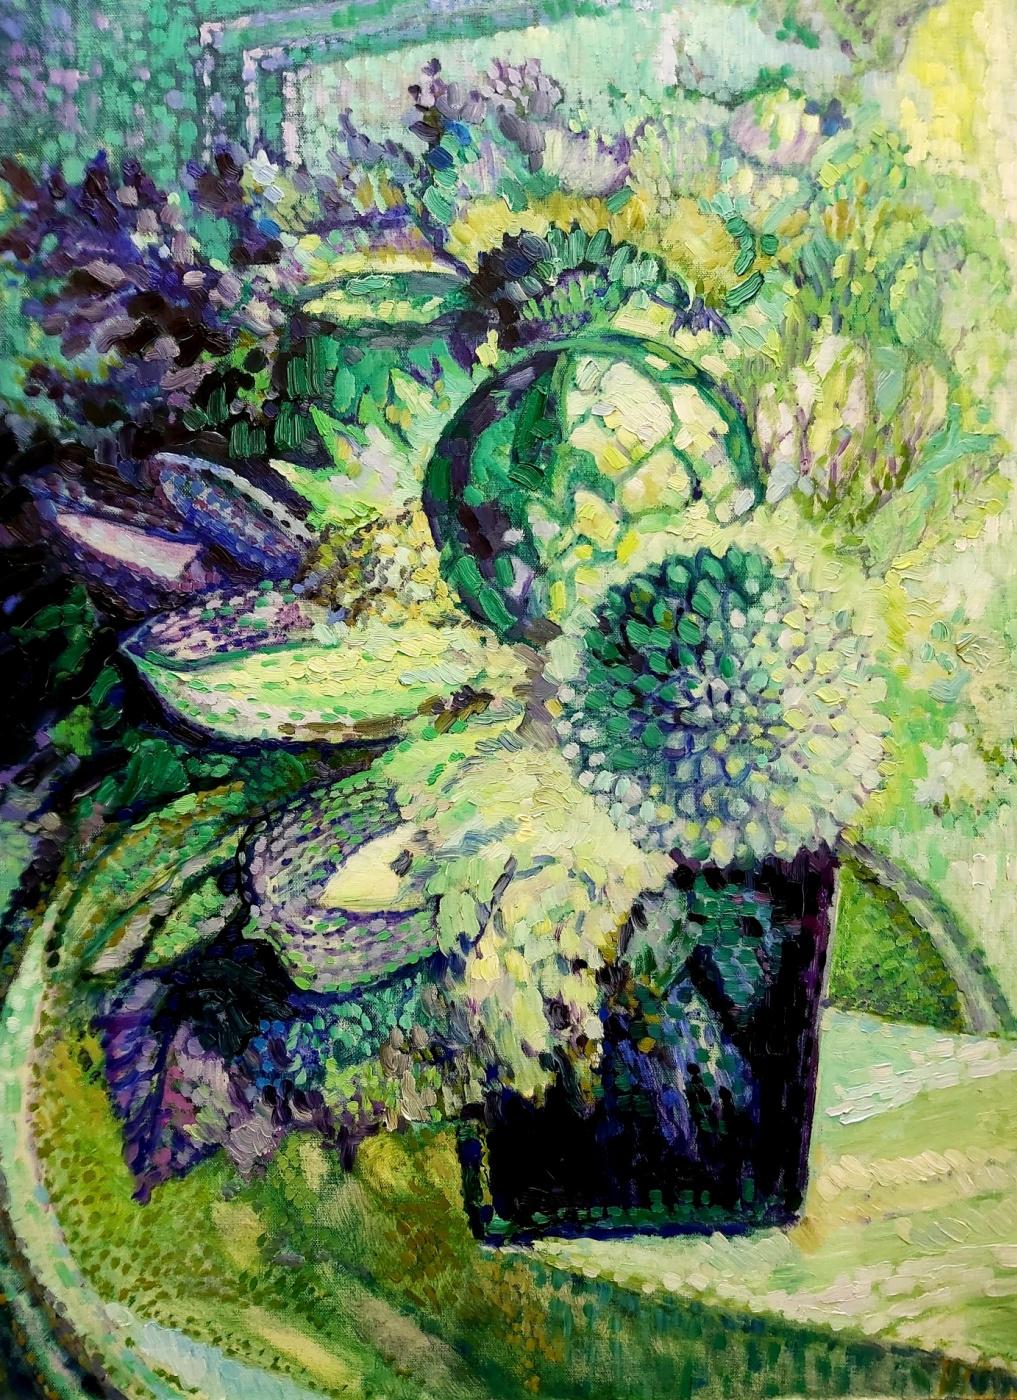 Alexander Mukha / Mukhomedeev-Boyarov. Bouquet Faberge Emerald